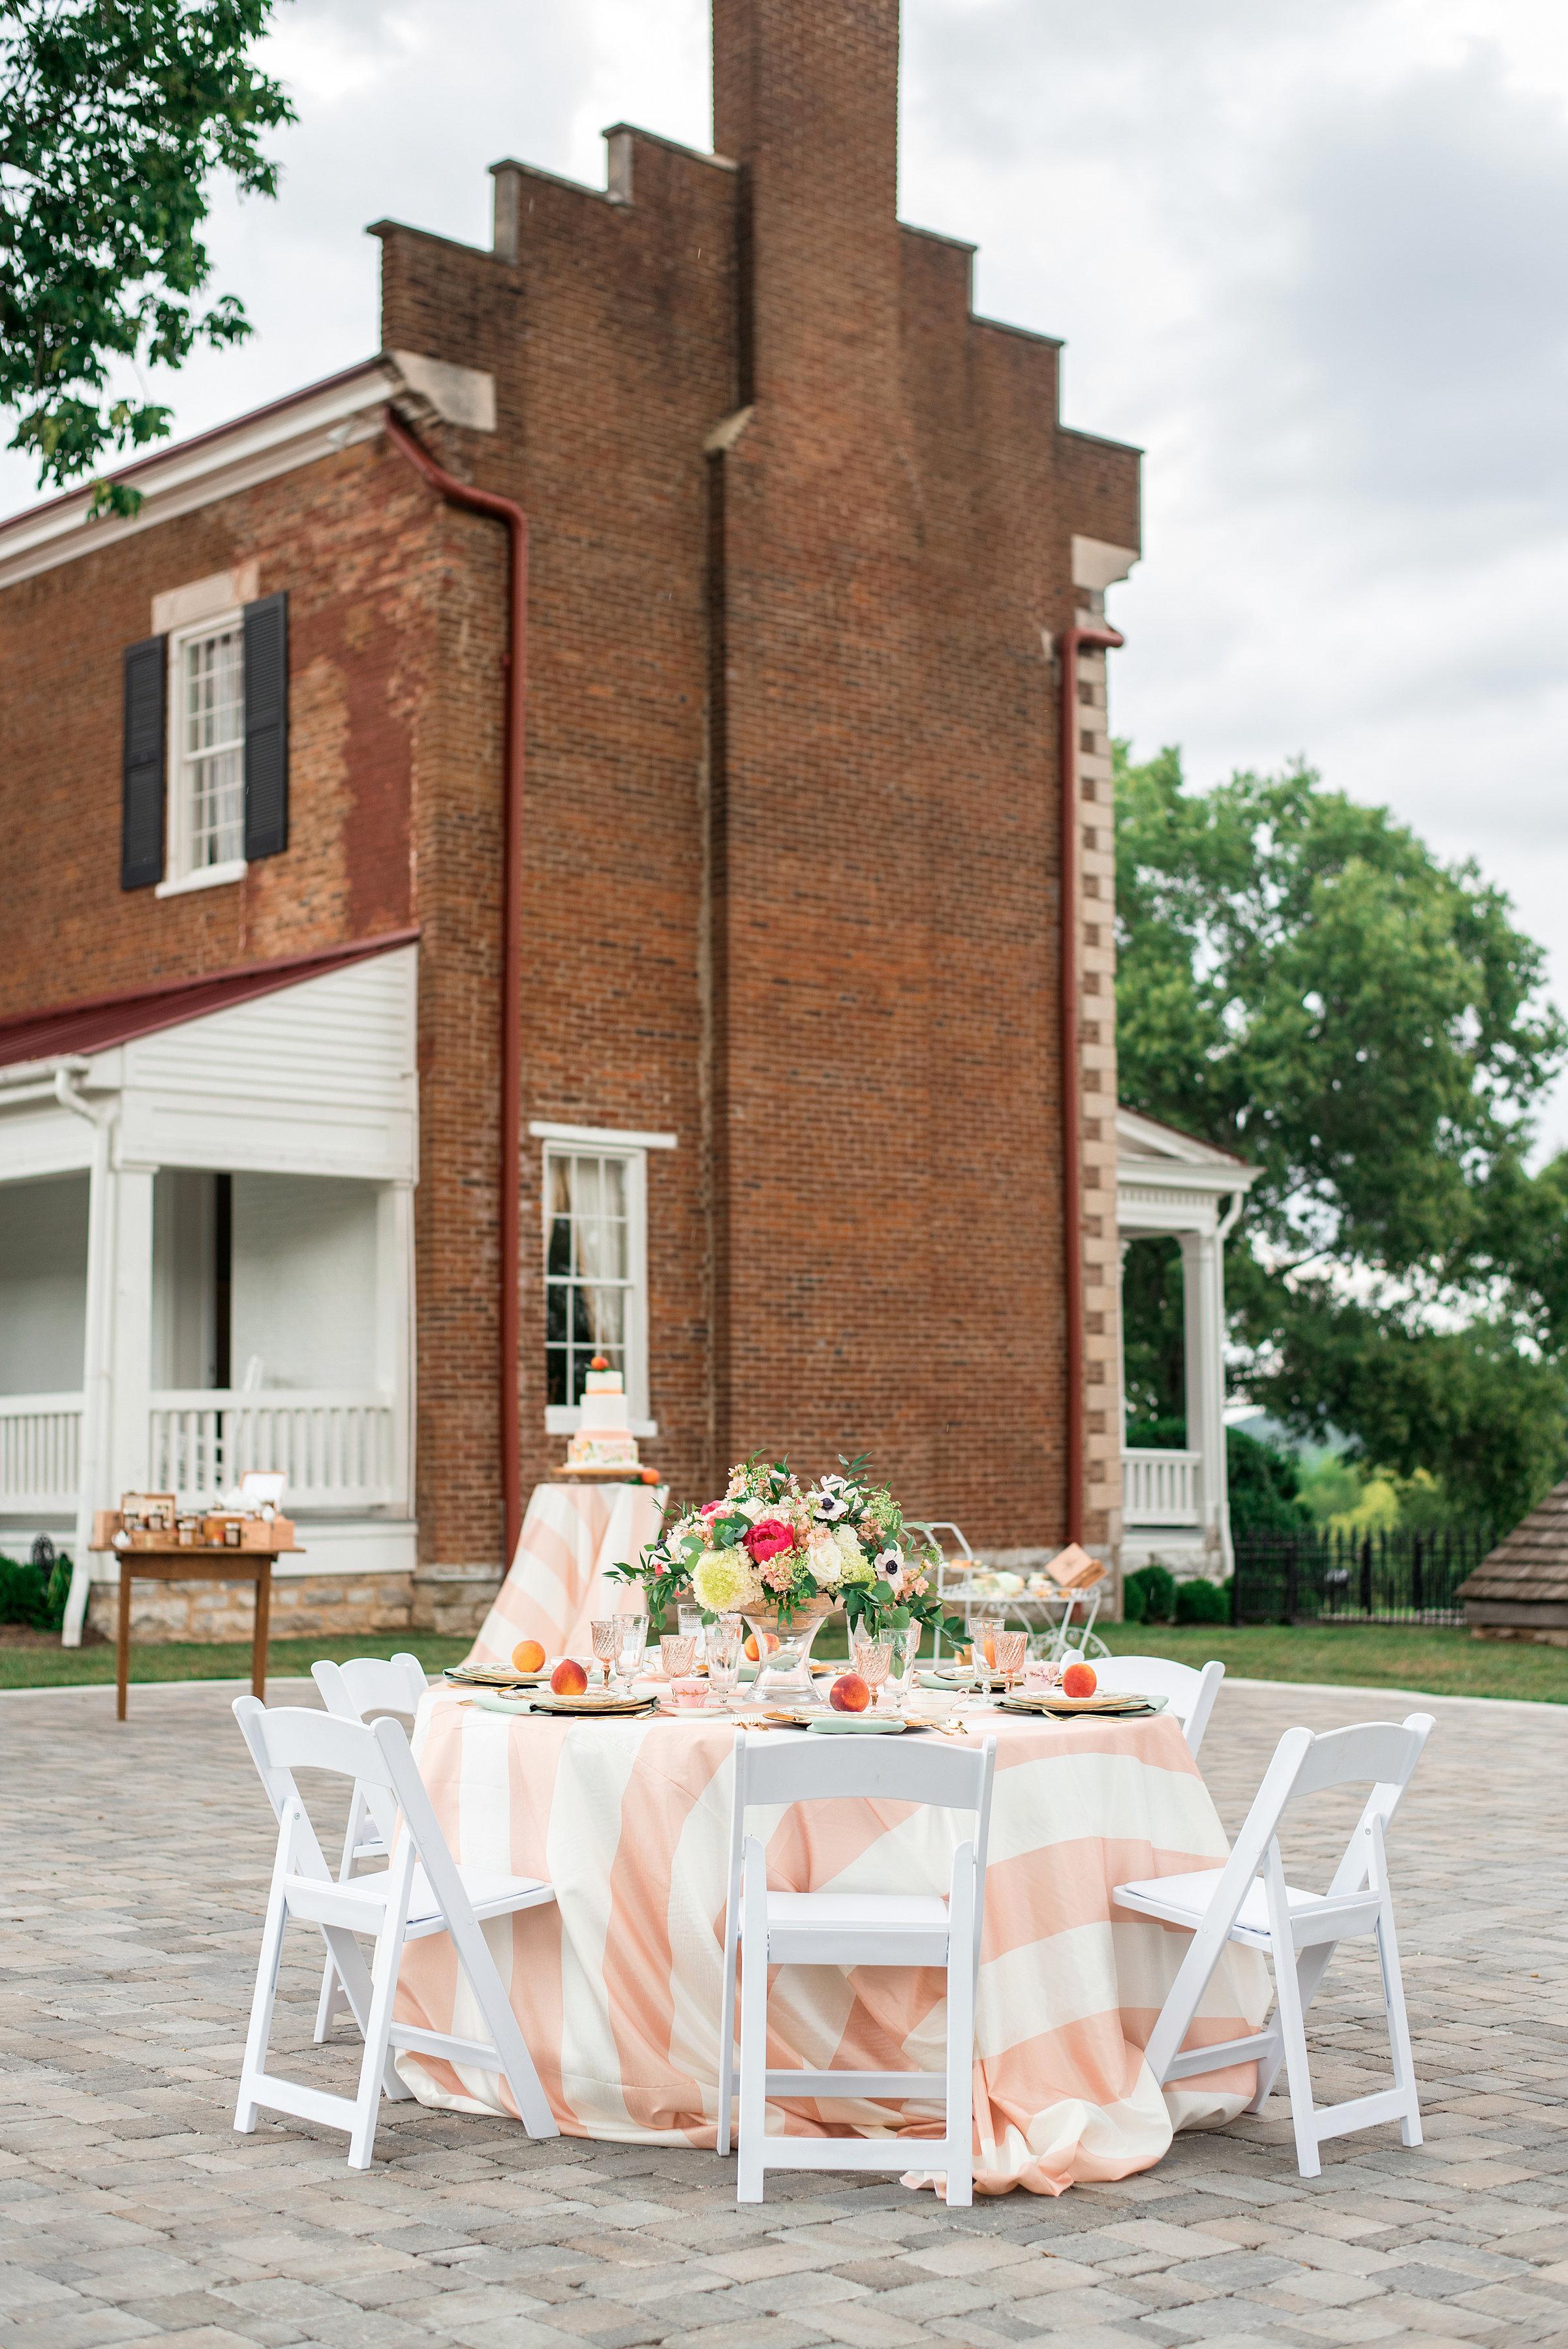 Ivory-Door-Studio-Ravenswood-Mansion-Styled-Wedding-0035.JPG